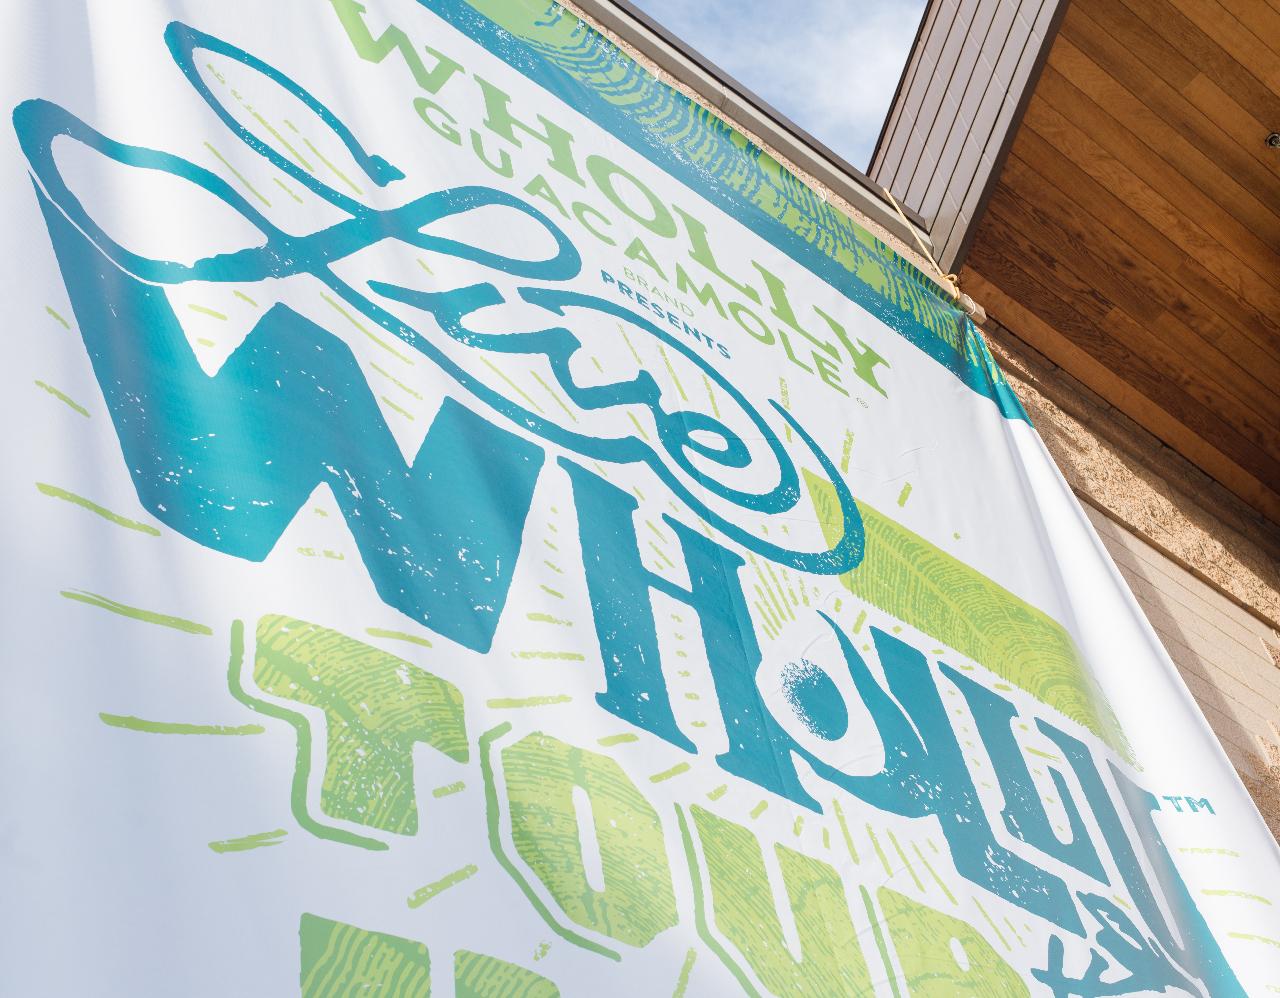 Live_Wholly_Tour_Content_Artboard 12.jpg